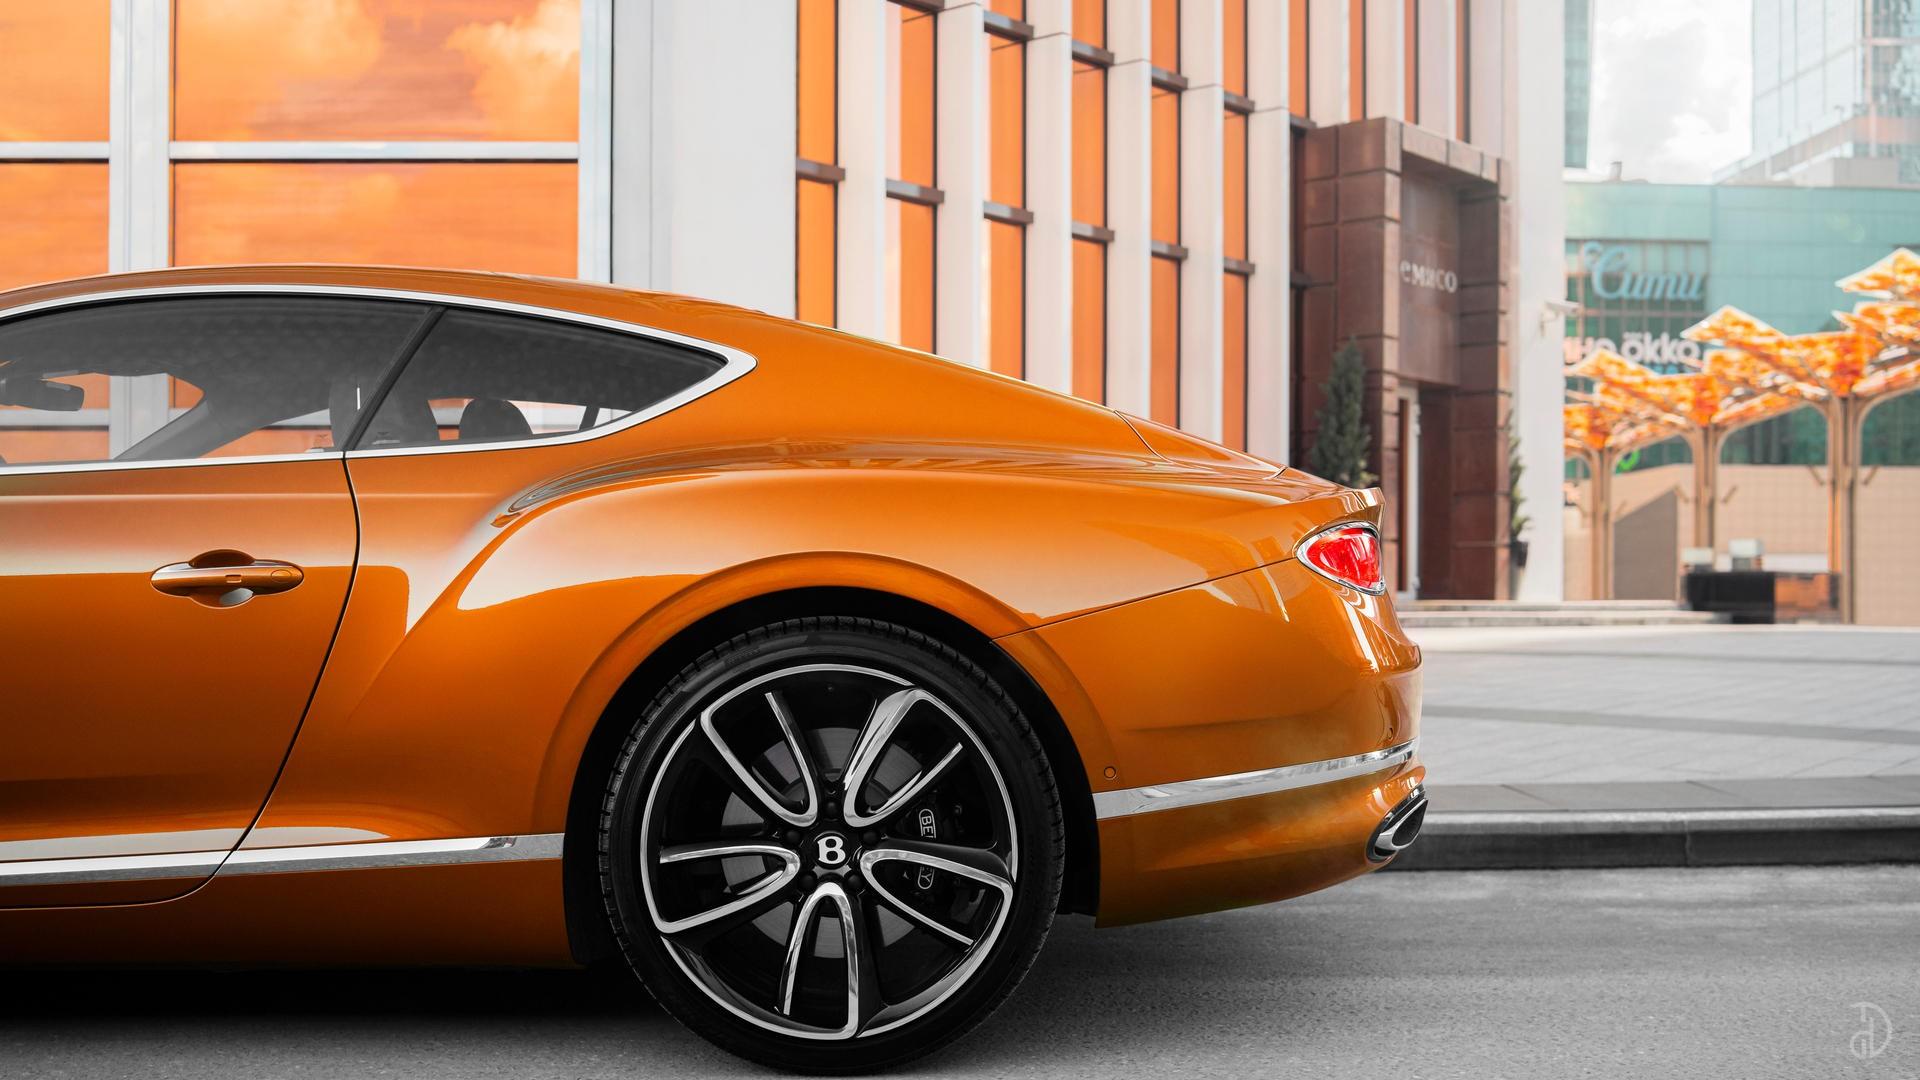 Аренда Bentley Continental GT 2020 в Сочи. Фото 4